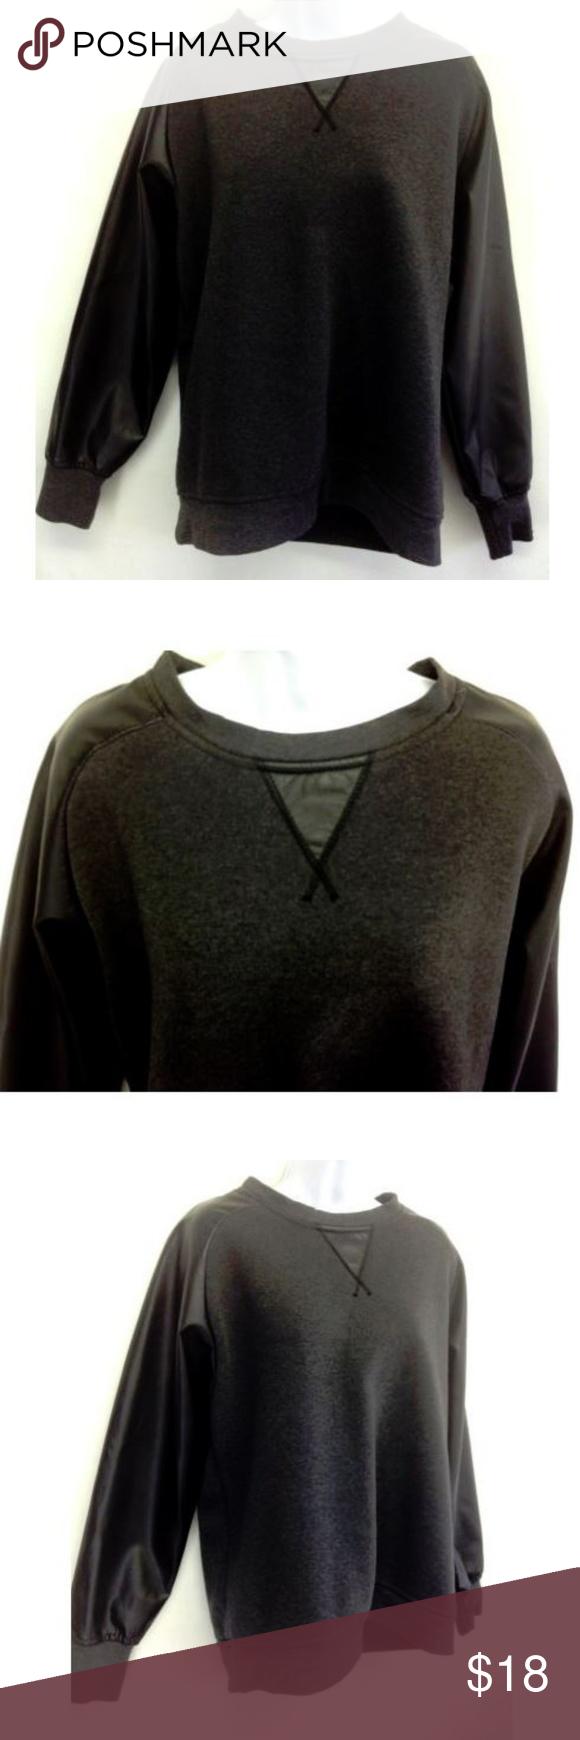 Nwot Repair Women Black Faux Leather Sweatshirt L Nwot Repair Women S Top Blouse Charcoal Body Black Faux Lea Leather Sweatshirt Sweatshirts Black Faux Leather [ 1740 x 580 Pixel ]